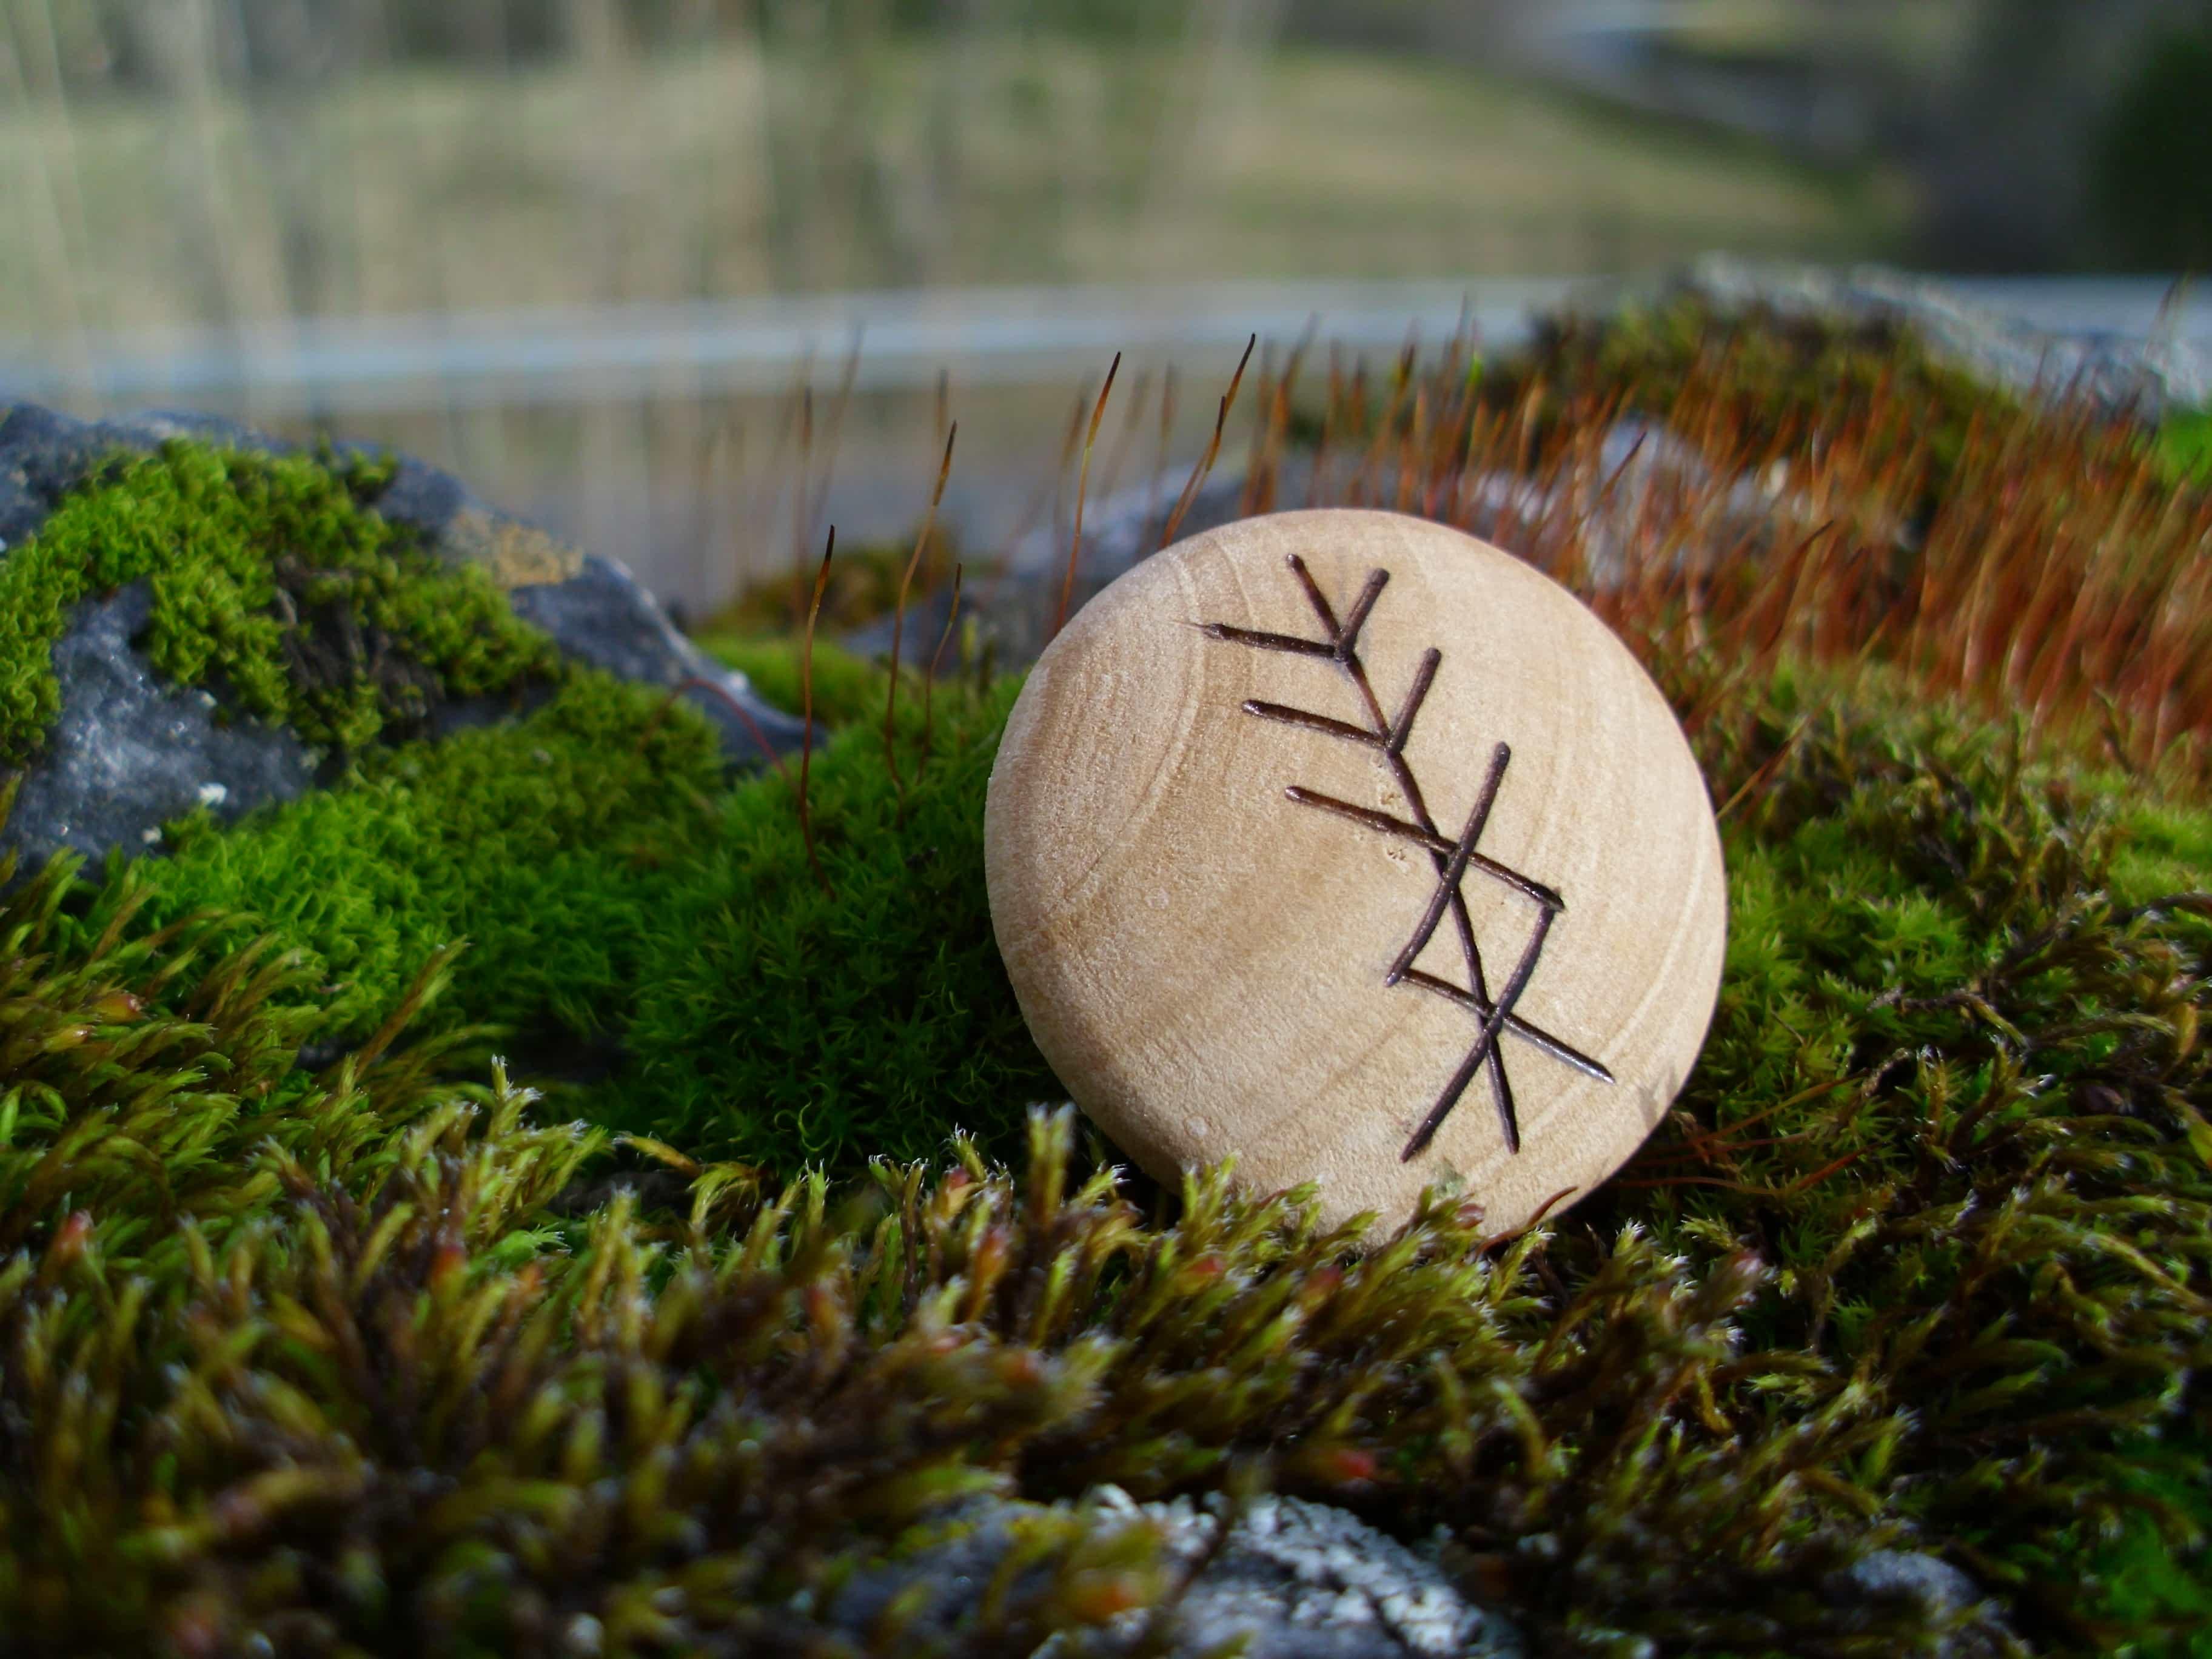 Pocket Rune for Personal Protection - Wooden Rune Amulet - Personlig beskyttelse